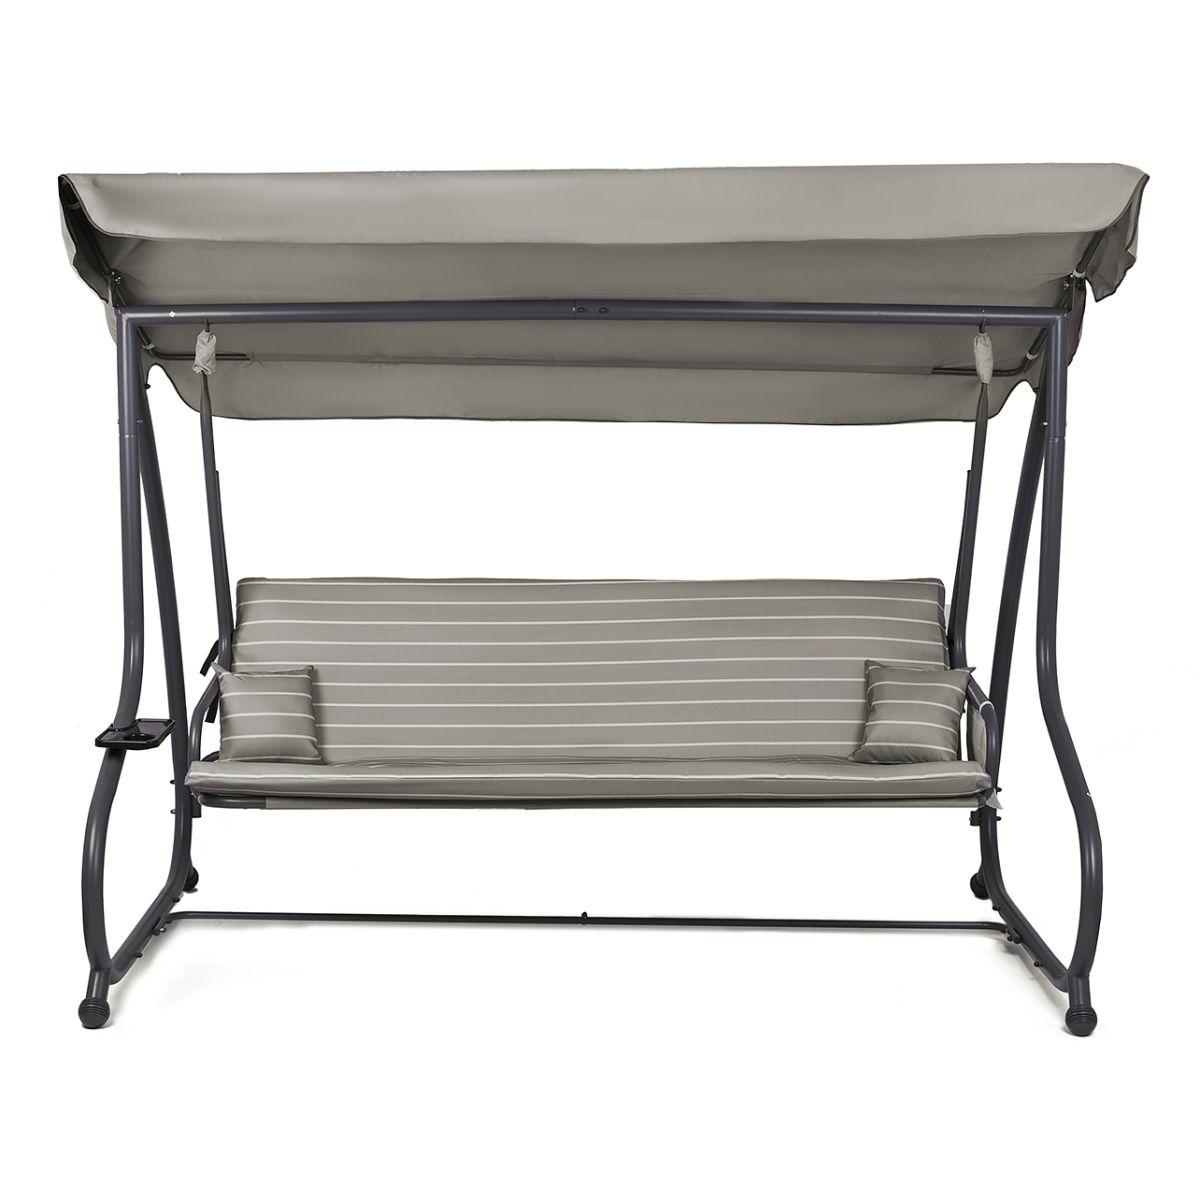 hollywoodschaukel gartenschaukel schaukelbank 4 sitzer. Black Bedroom Furniture Sets. Home Design Ideas